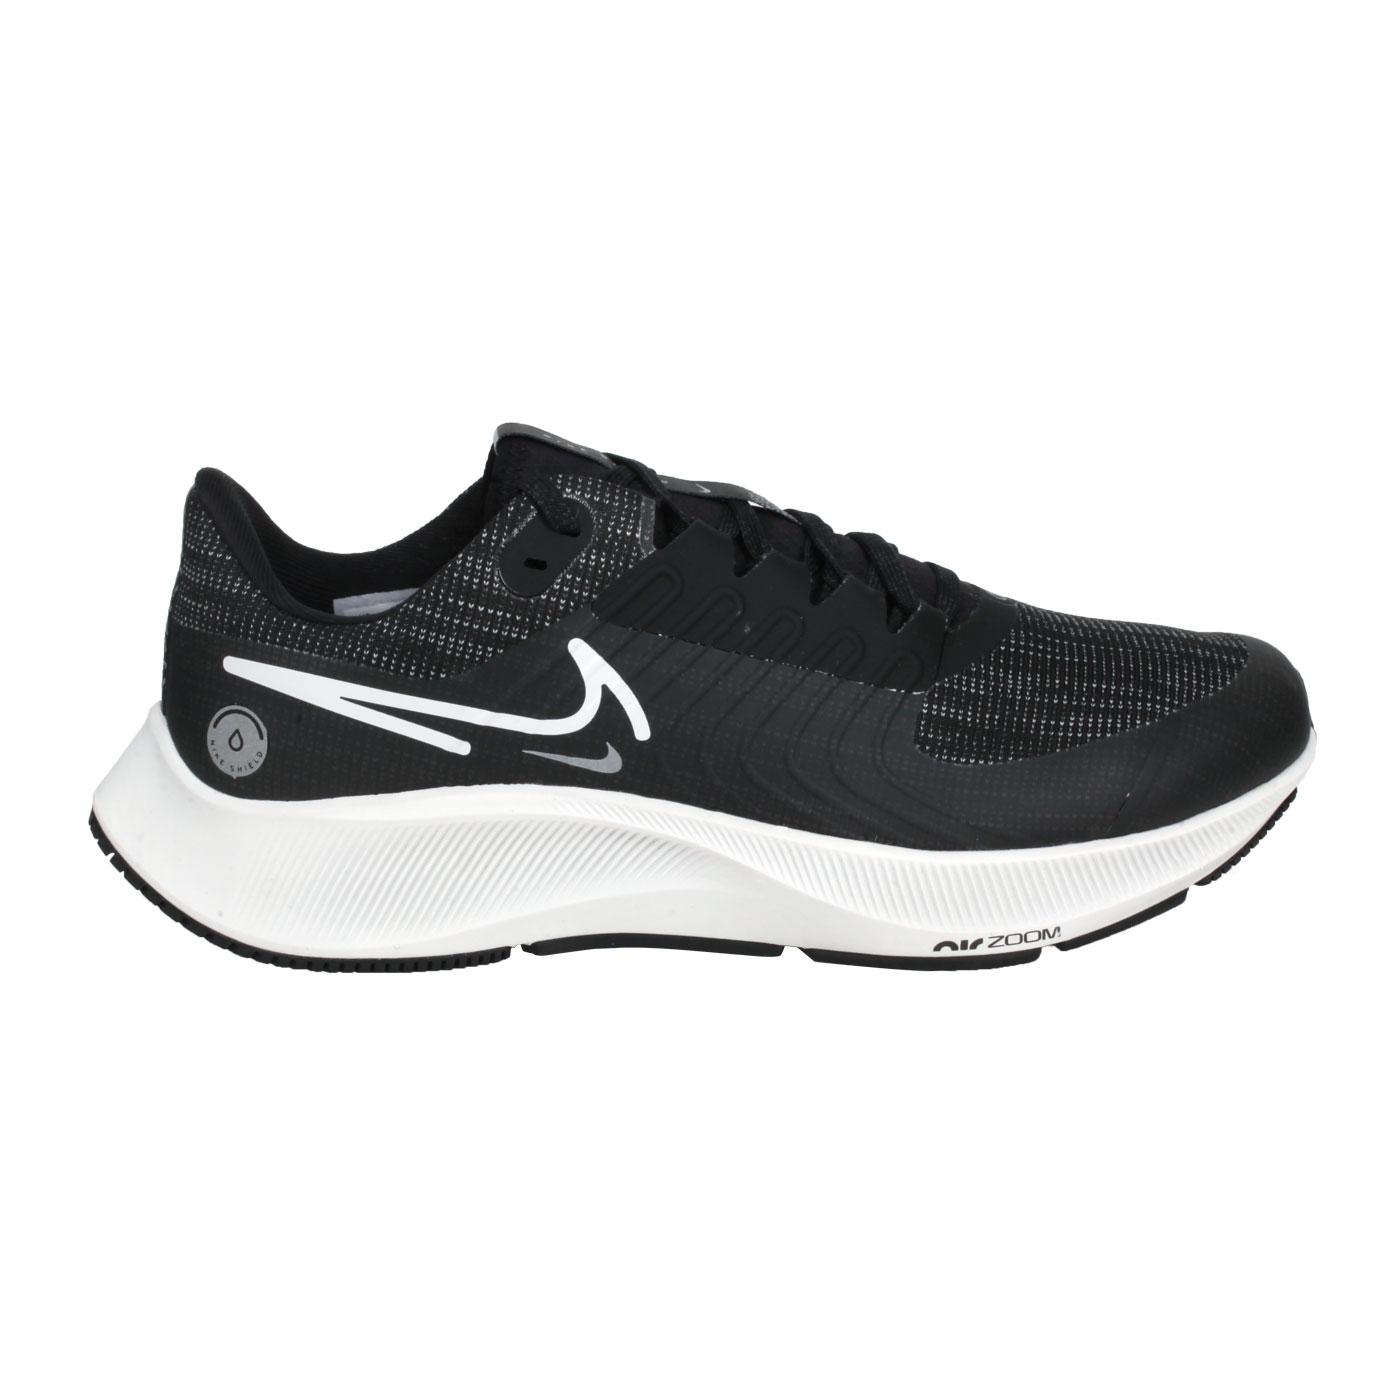 NIKE 男款慢跑運動鞋   @AIR ZOOM PEGASUS 38 SHIELD@DC4073-001 - 灰黑白